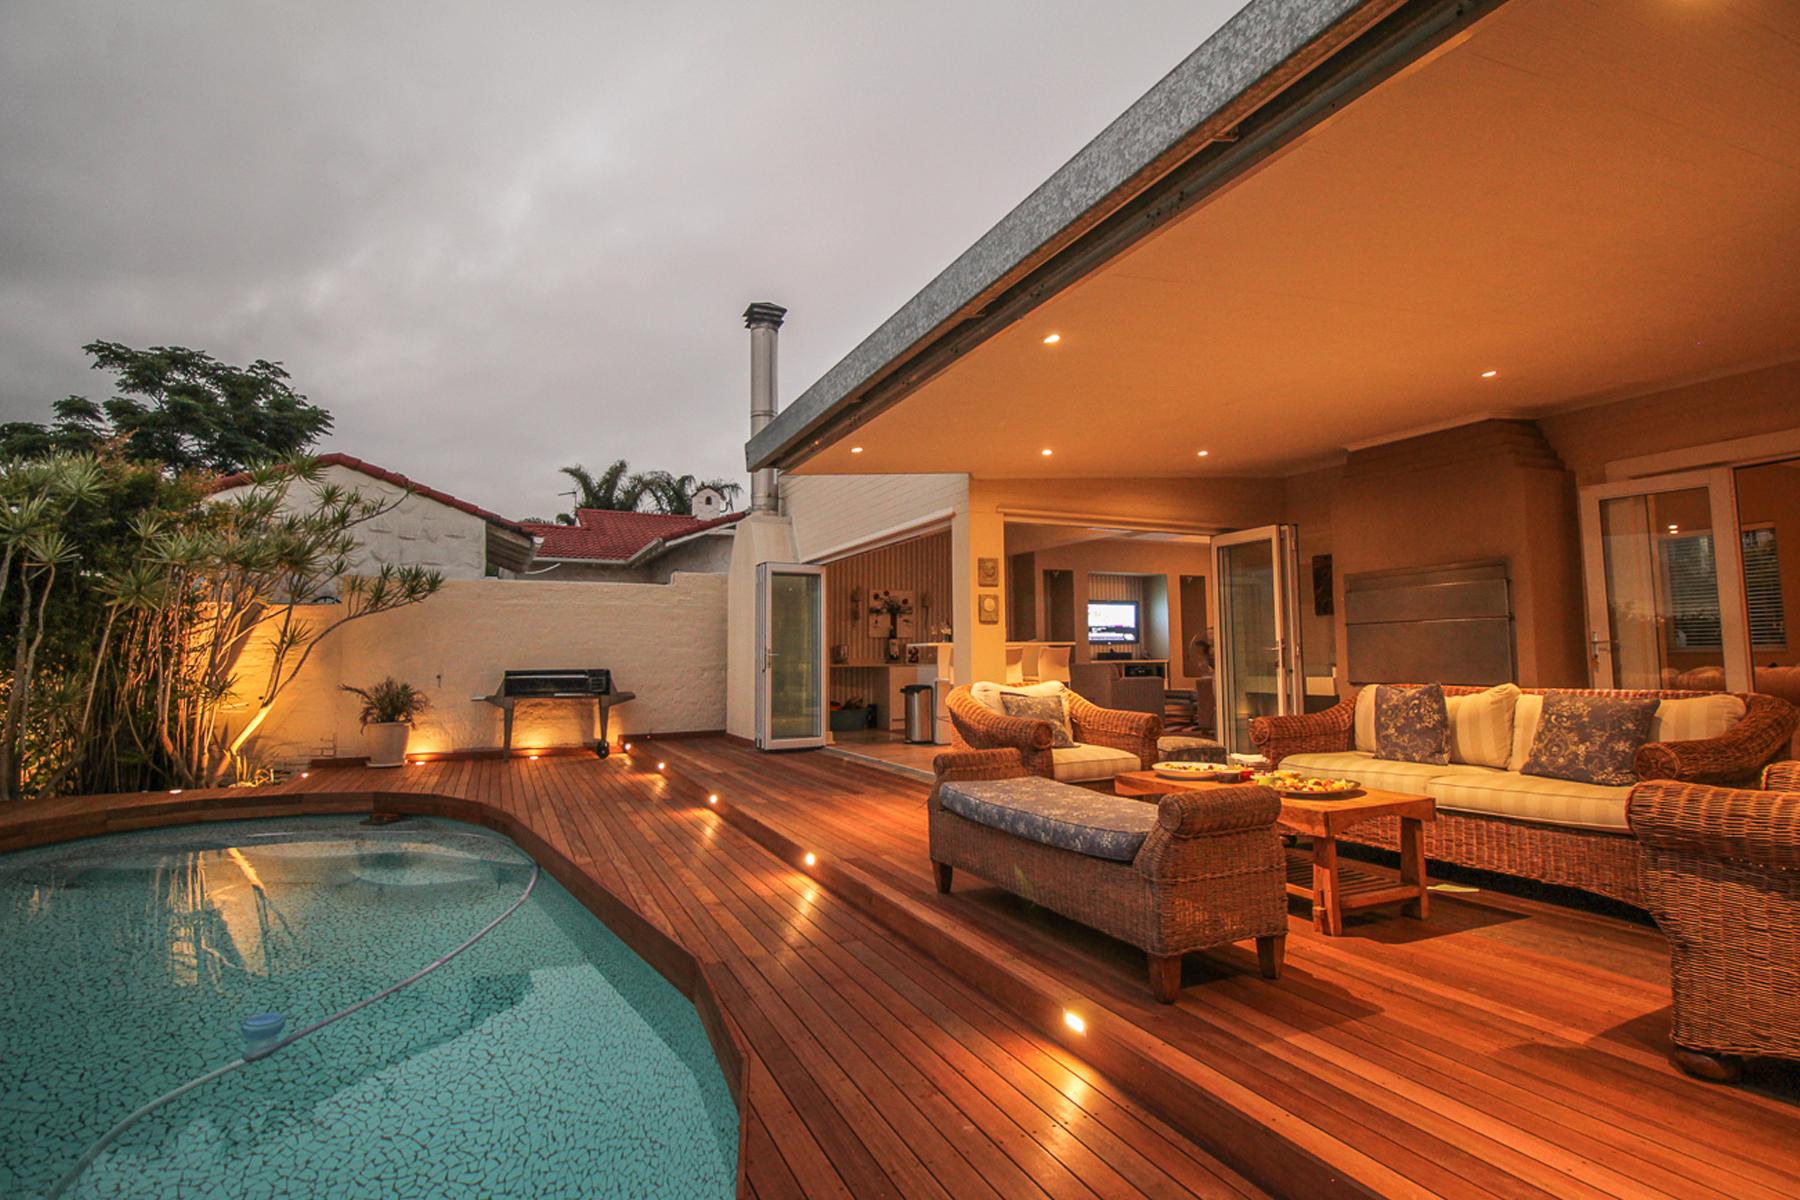 Tài Sản Bán Port Elizabeth